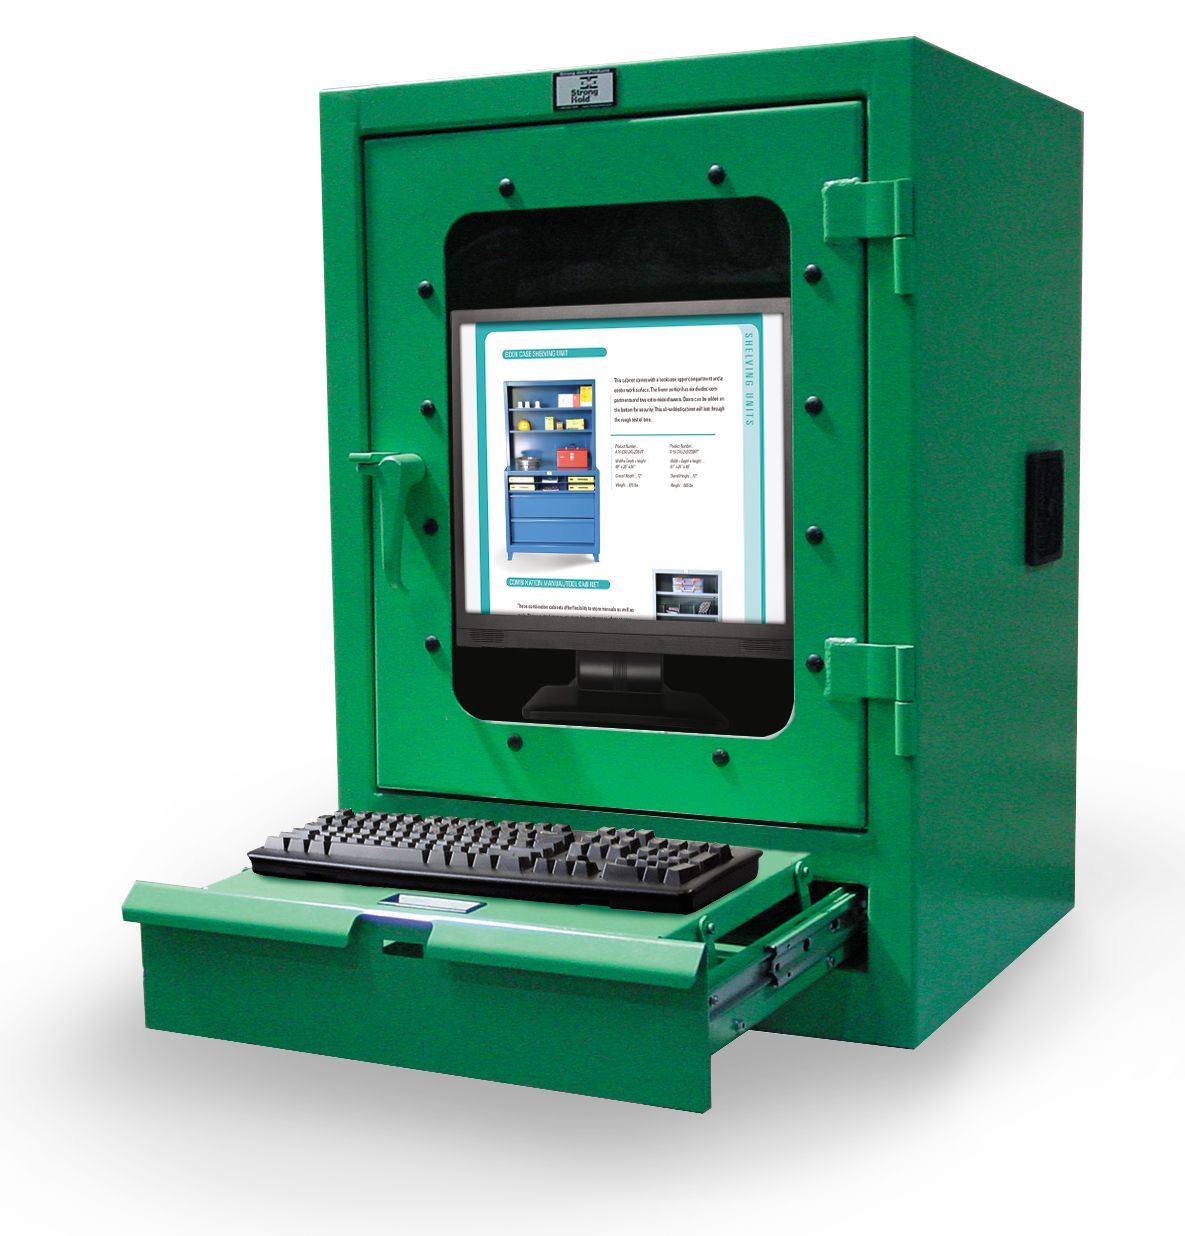 Desktop Computer Cabinet With Keyboard Drawer Desktop Computers Computer Industrial Storage